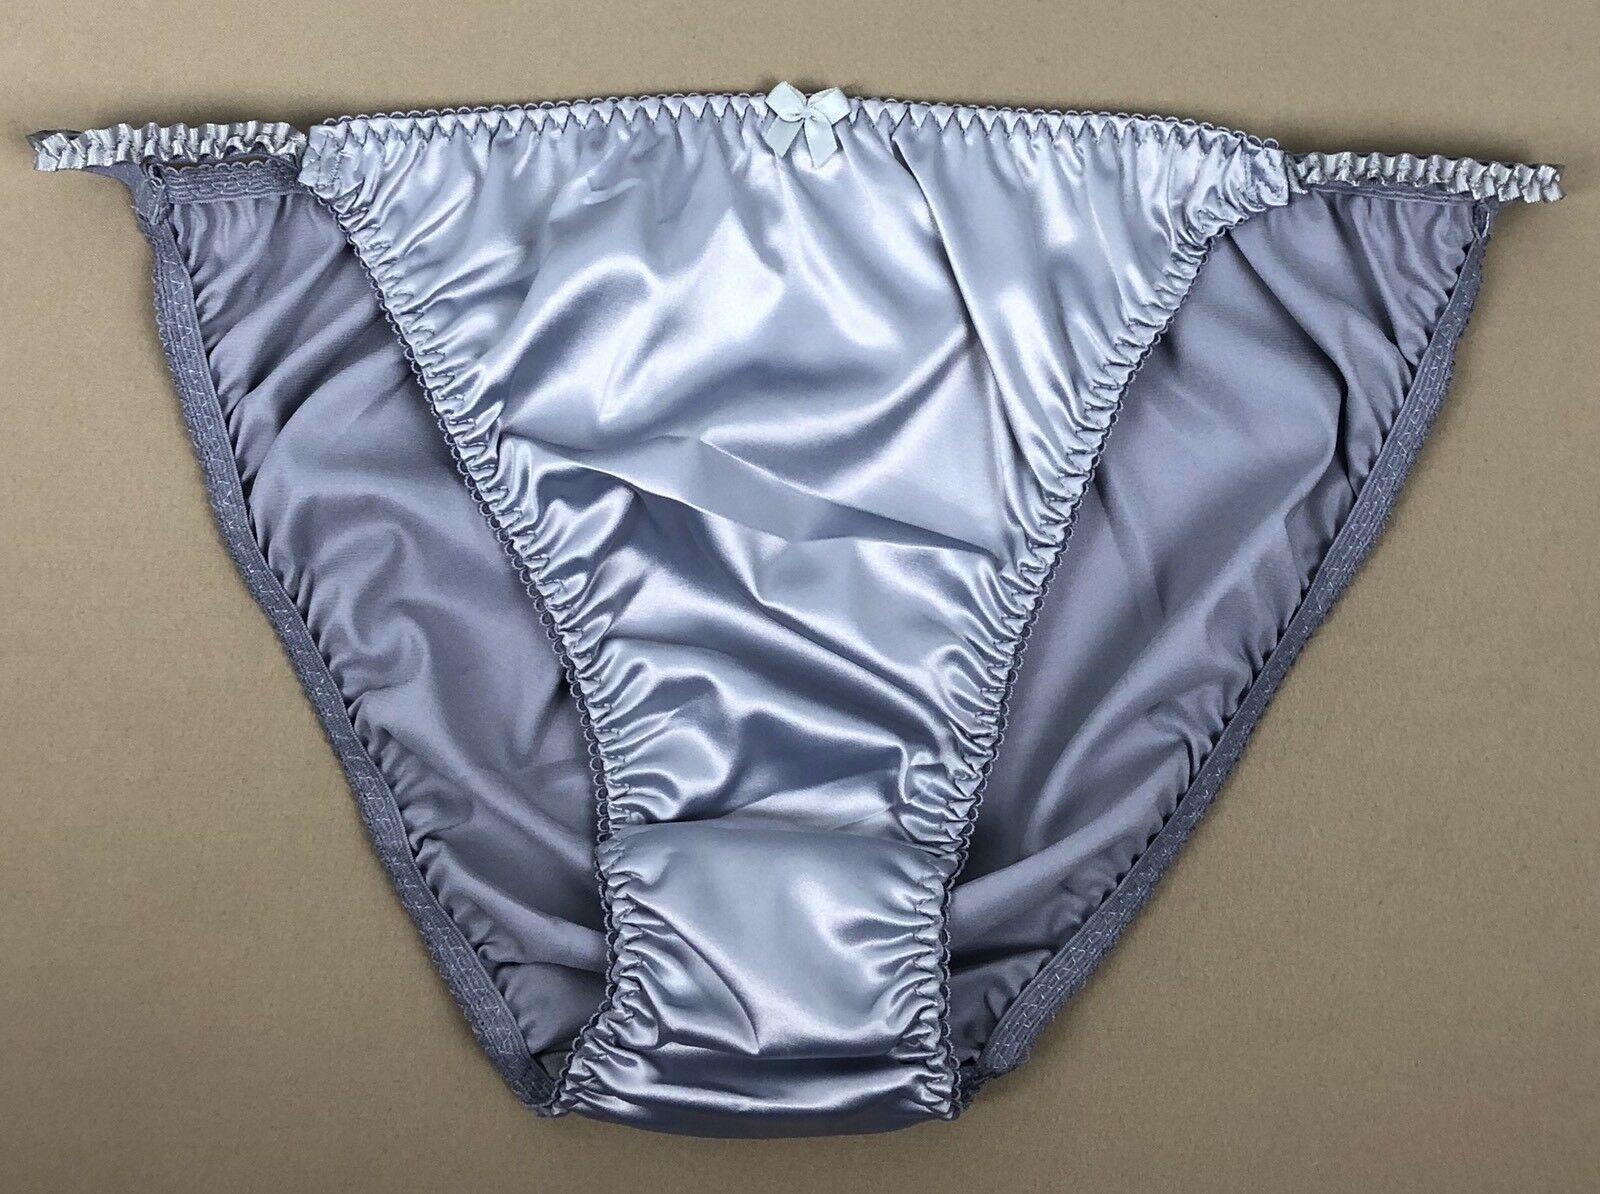 VTG style Satin shiny wetlook ladies sissy WHITE Polka Dot panties String bikini